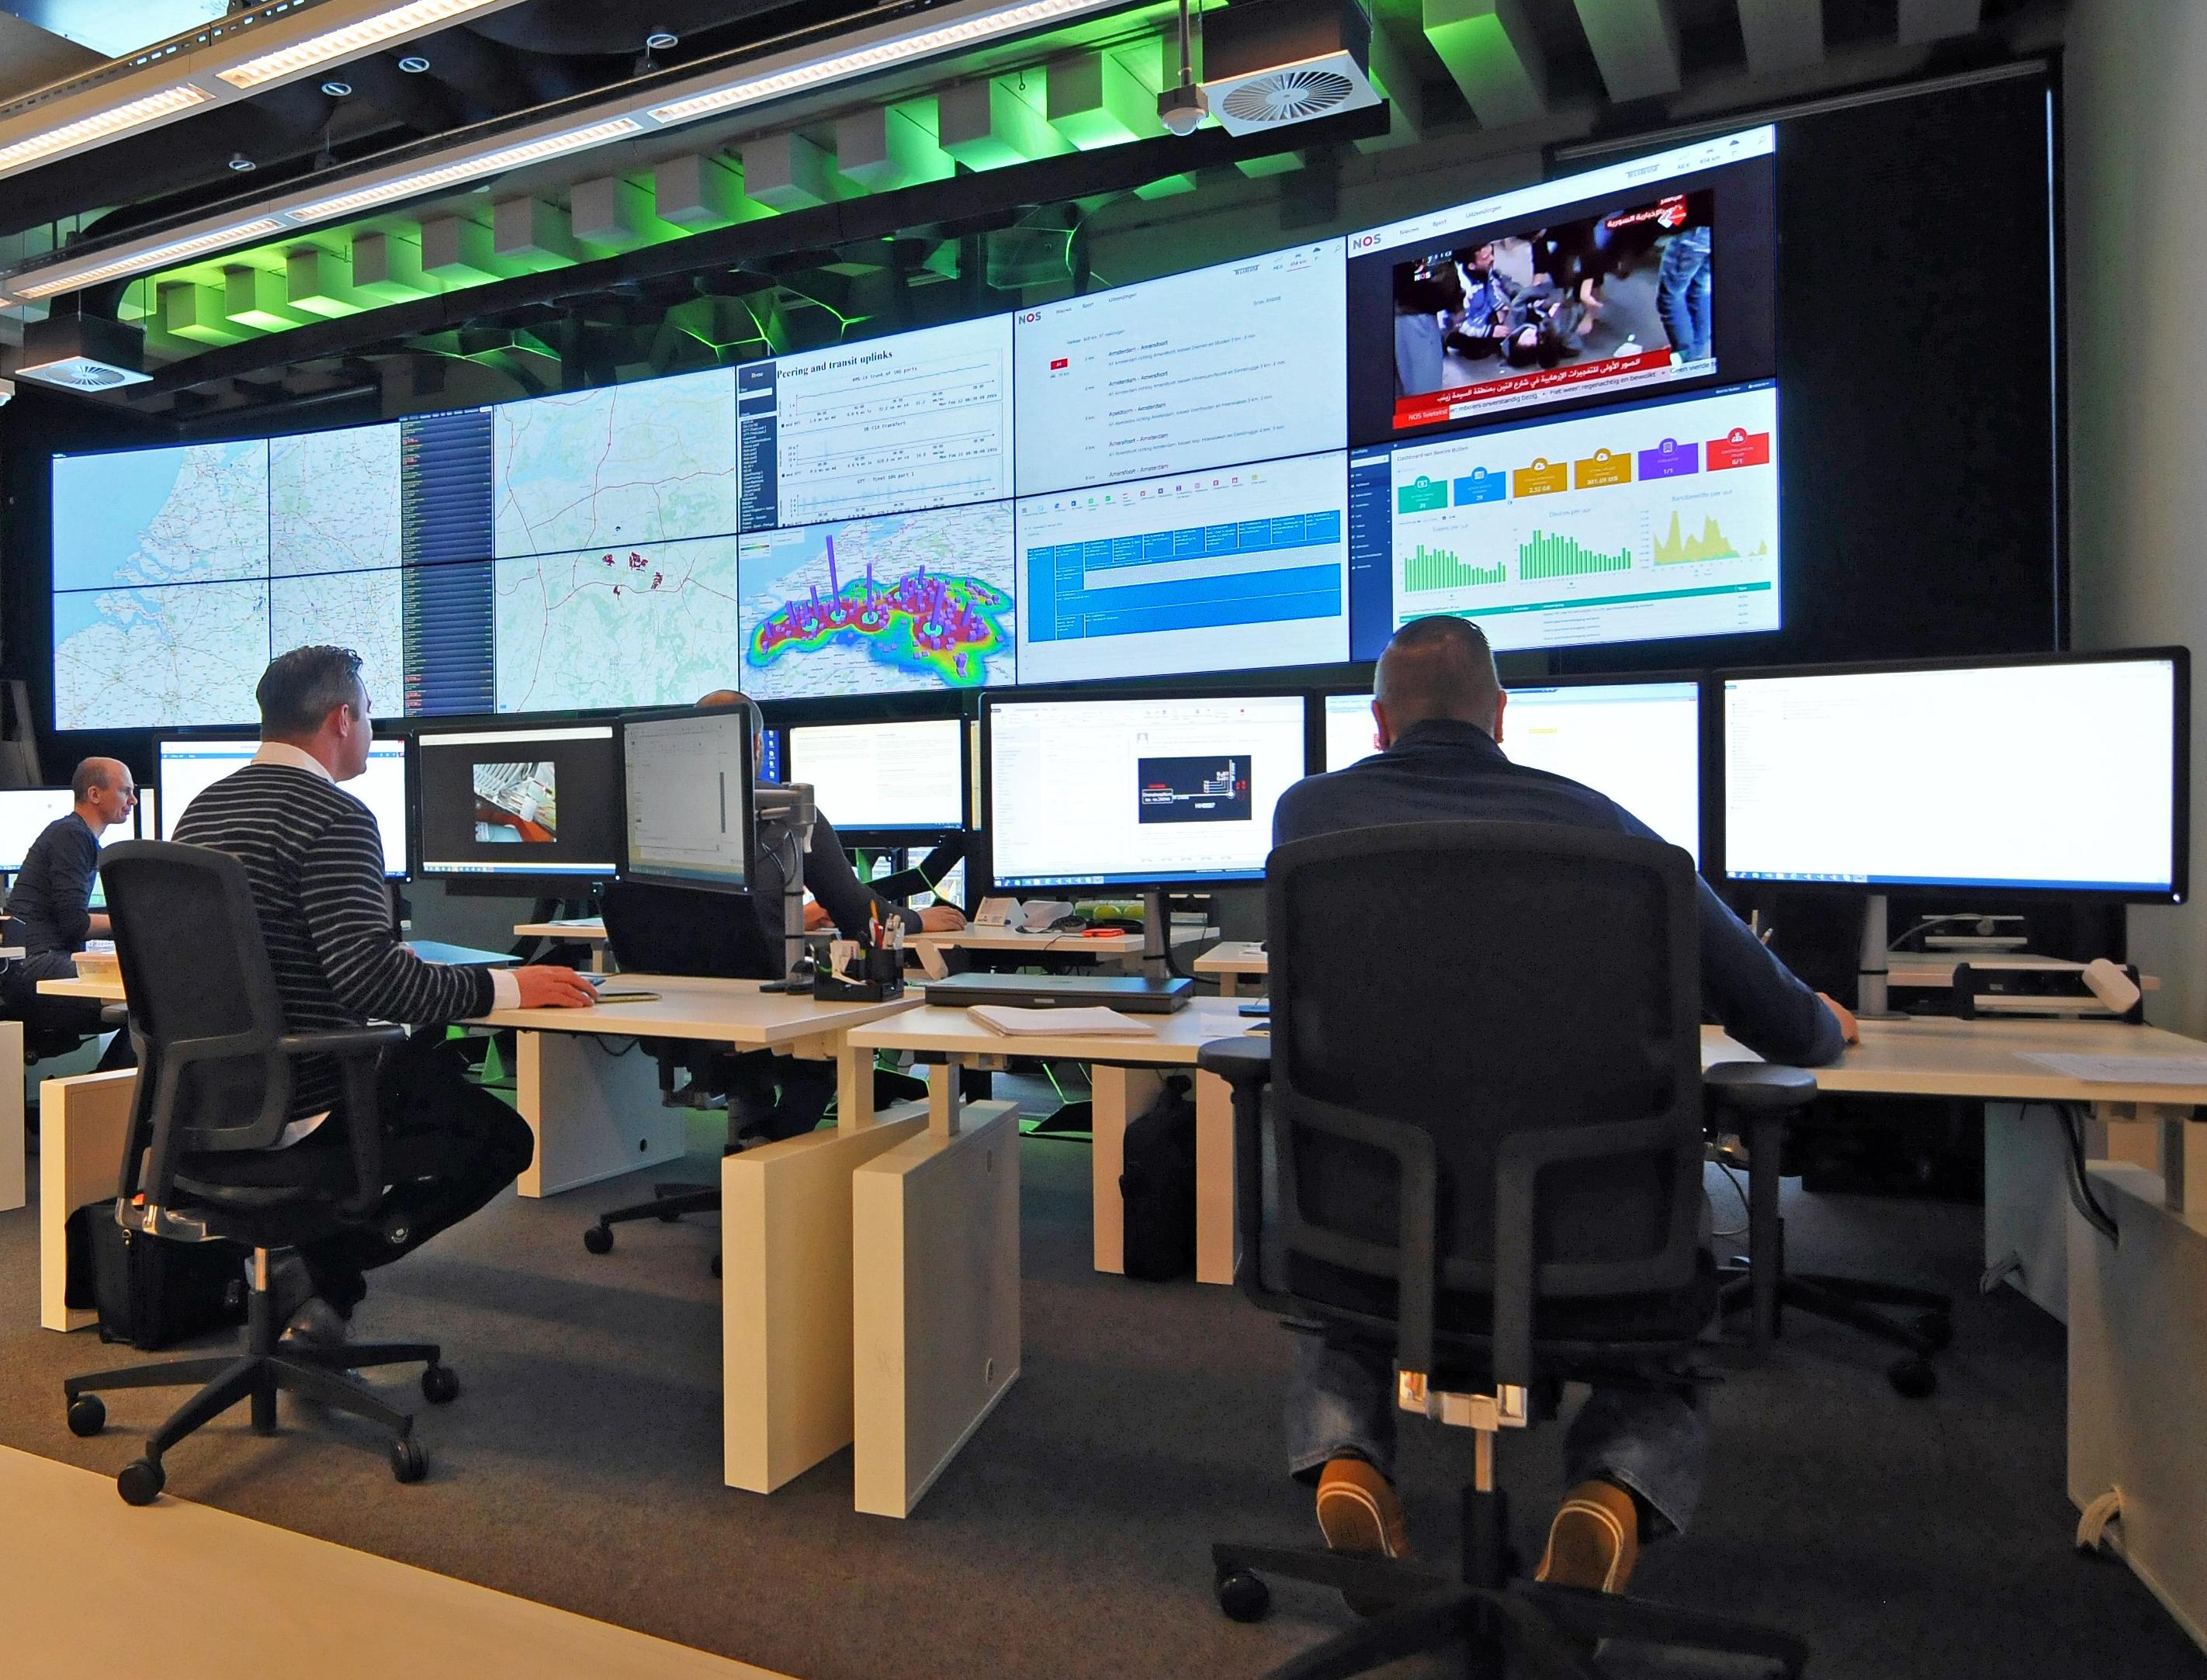 SPIE Infra Network Solutions